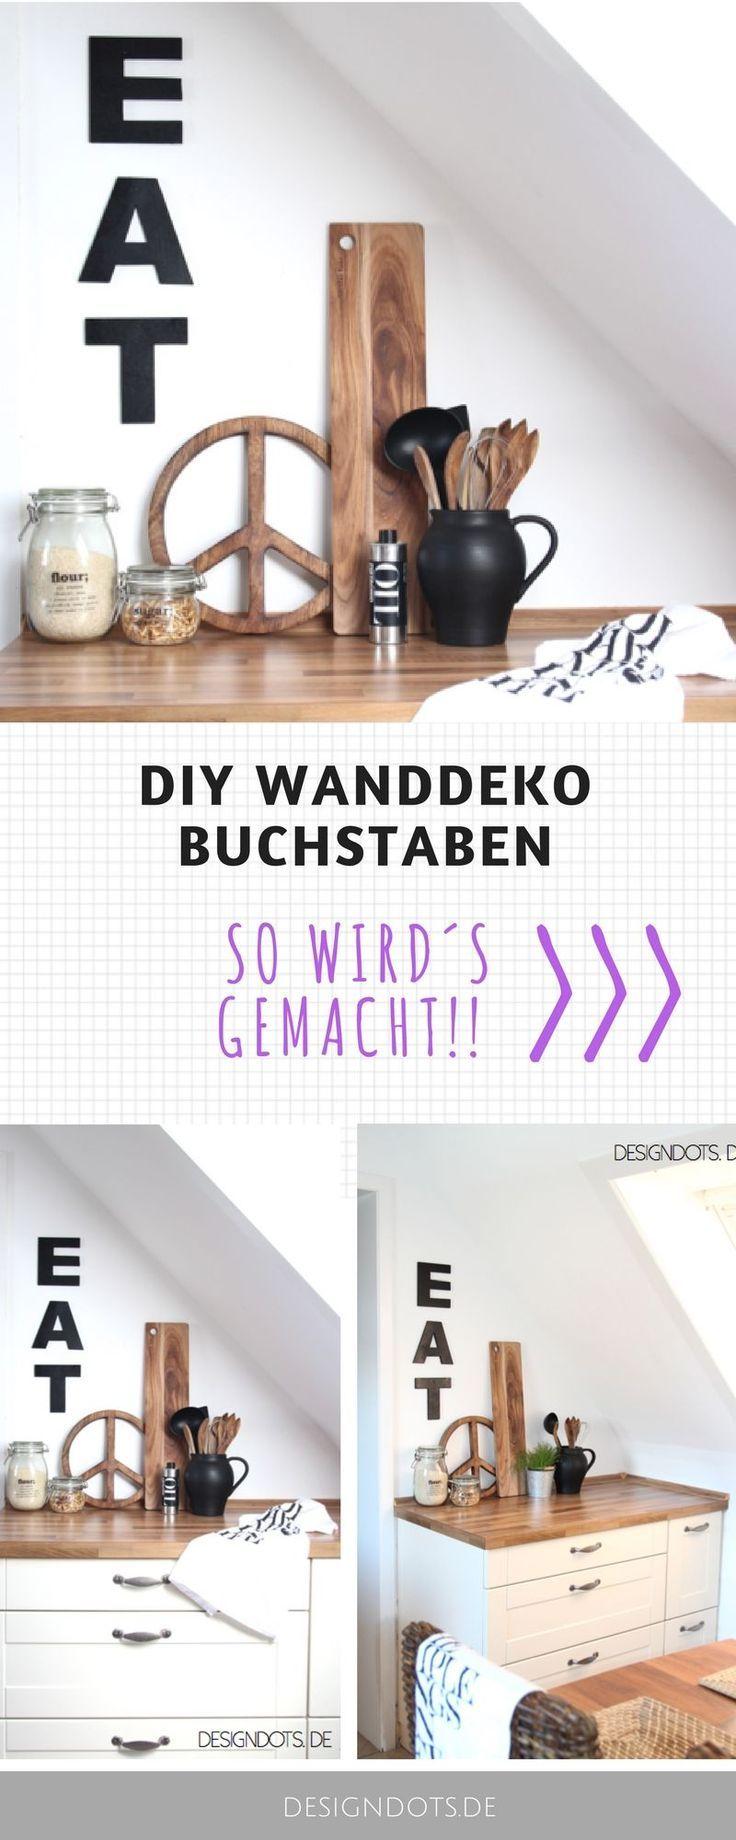 Diy Etiketten Fur Vorratsglaser Zum Ausdrucken Diy Wanddeko Wanddeko Kuchendekoration